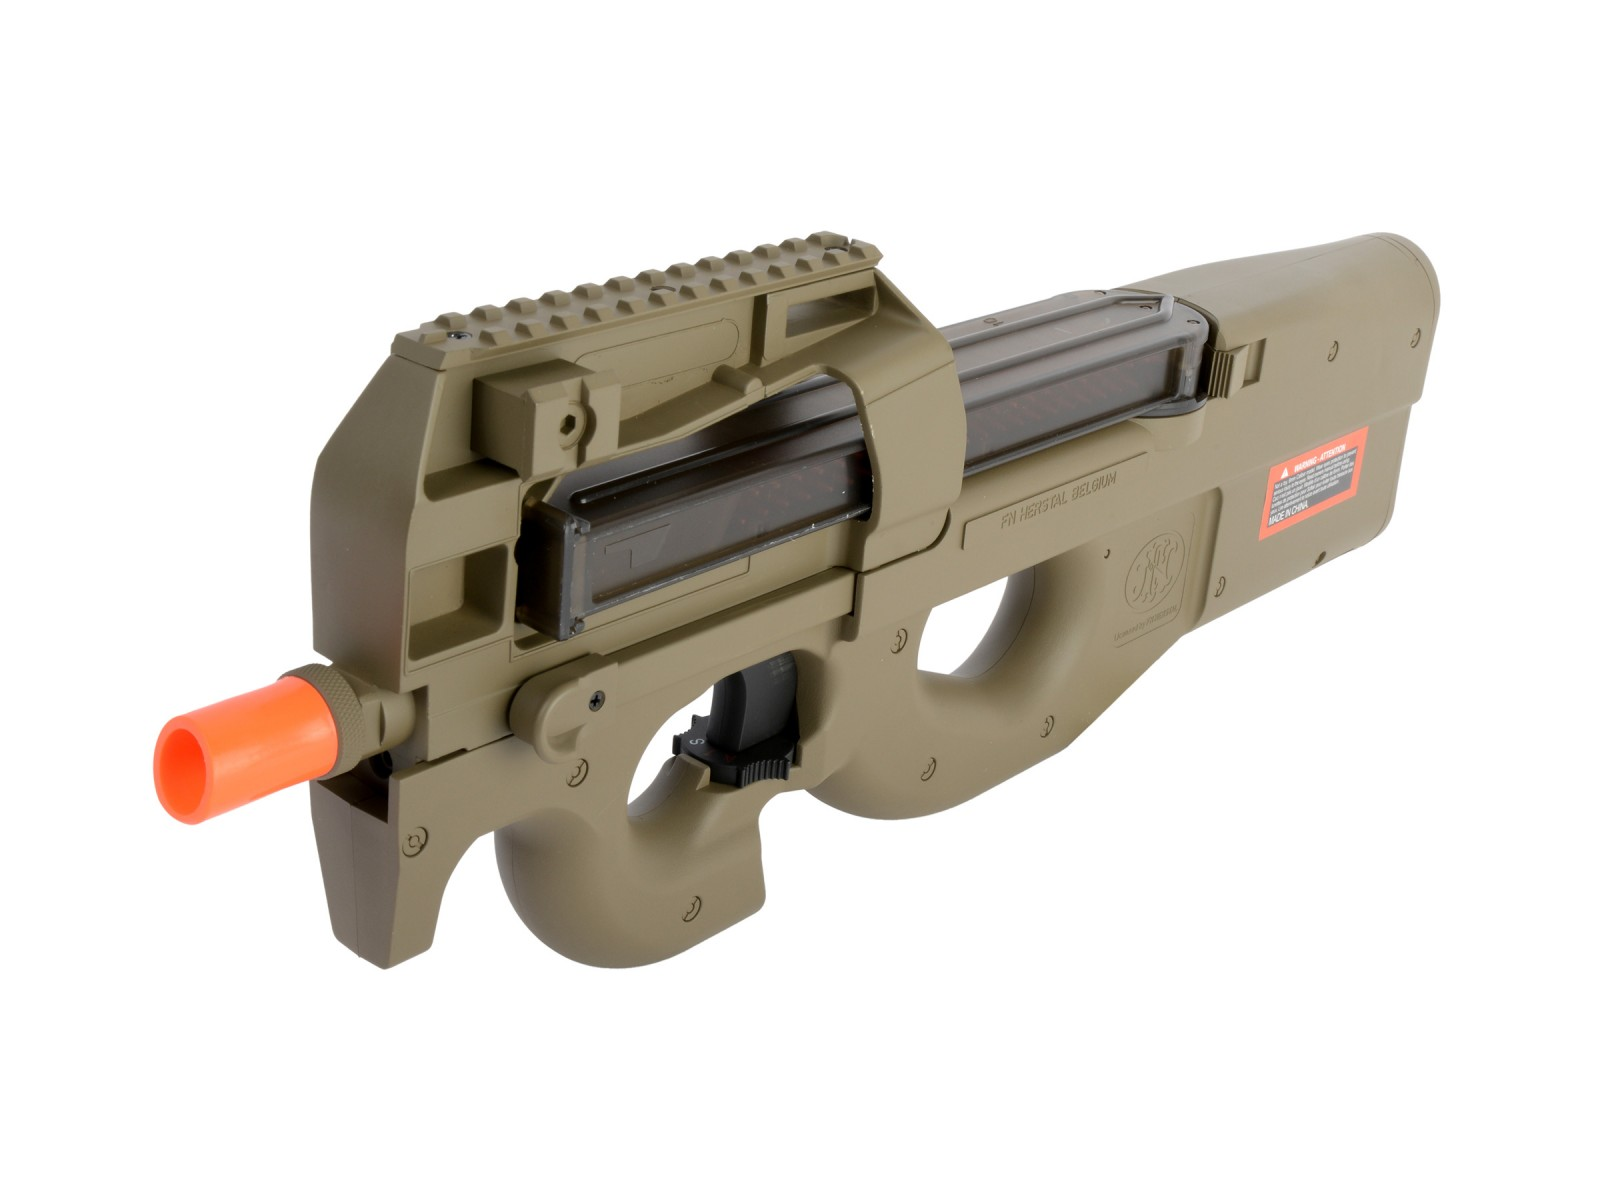 FN_Herstal_P90_AEG_Electric_Airsoft_Rifle_Tan_6mm